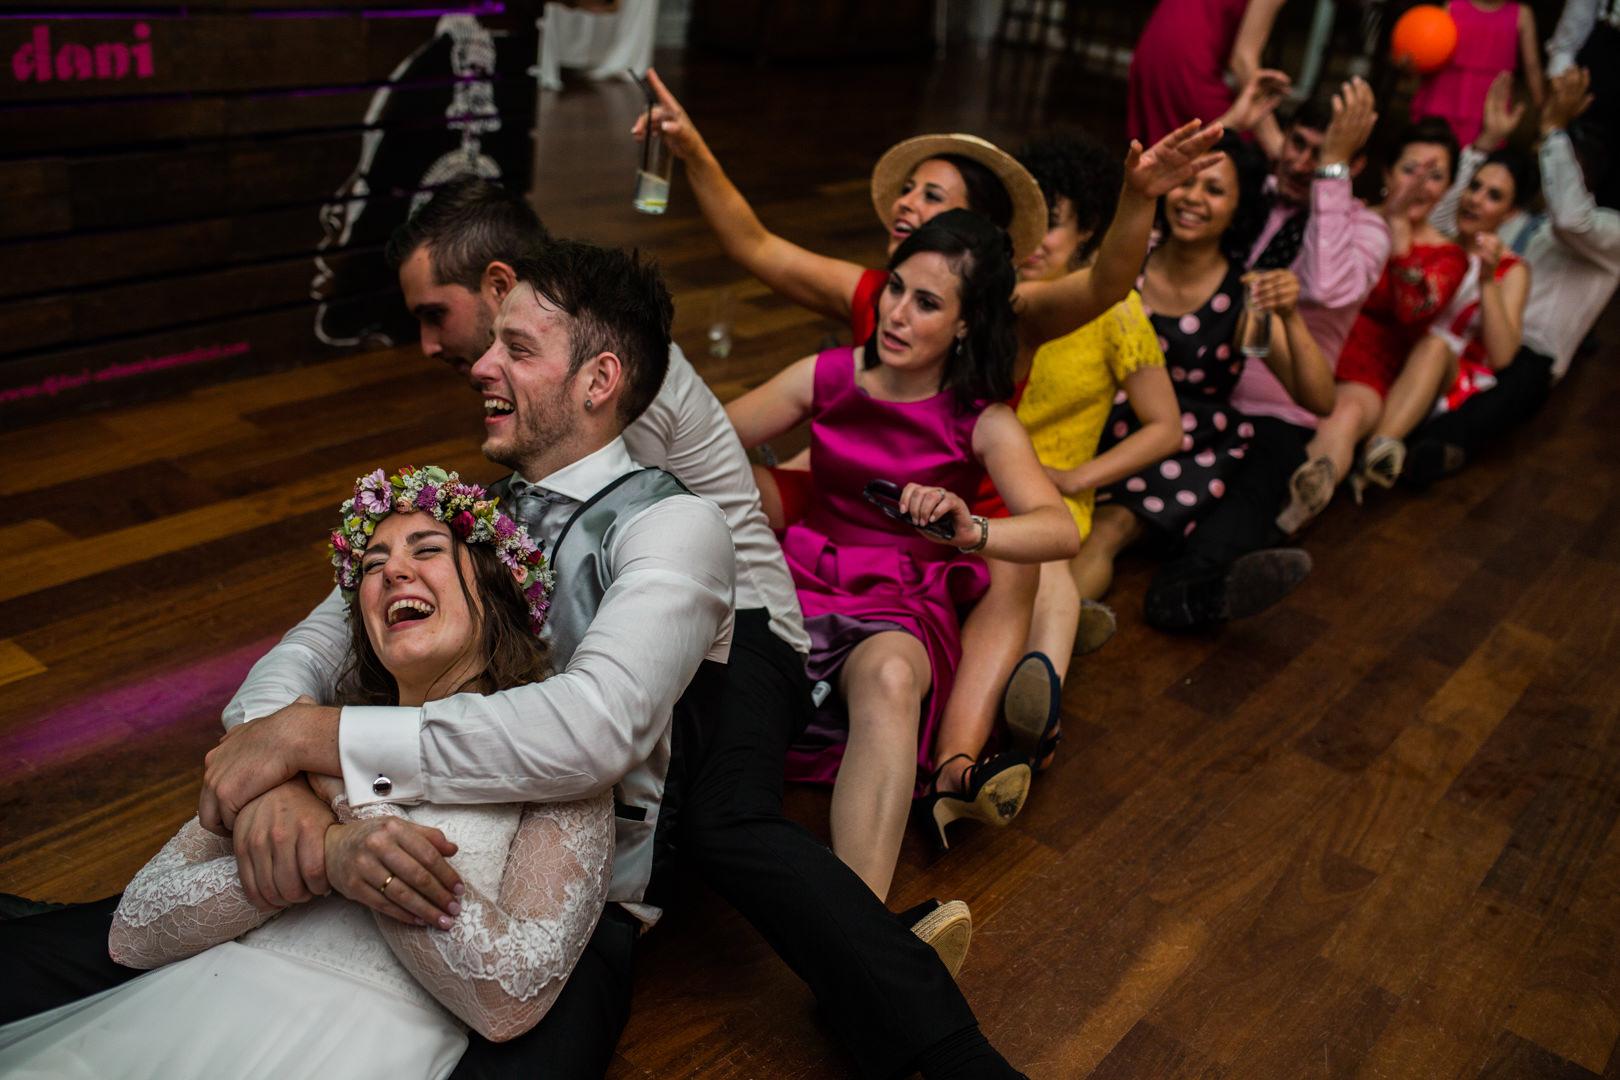 Boda-Lucia-Javi-Lugo-Rafael-Torres-fotografo-bodas-sevilla-madrid-barcelona-wedding-photographer--45.jpg